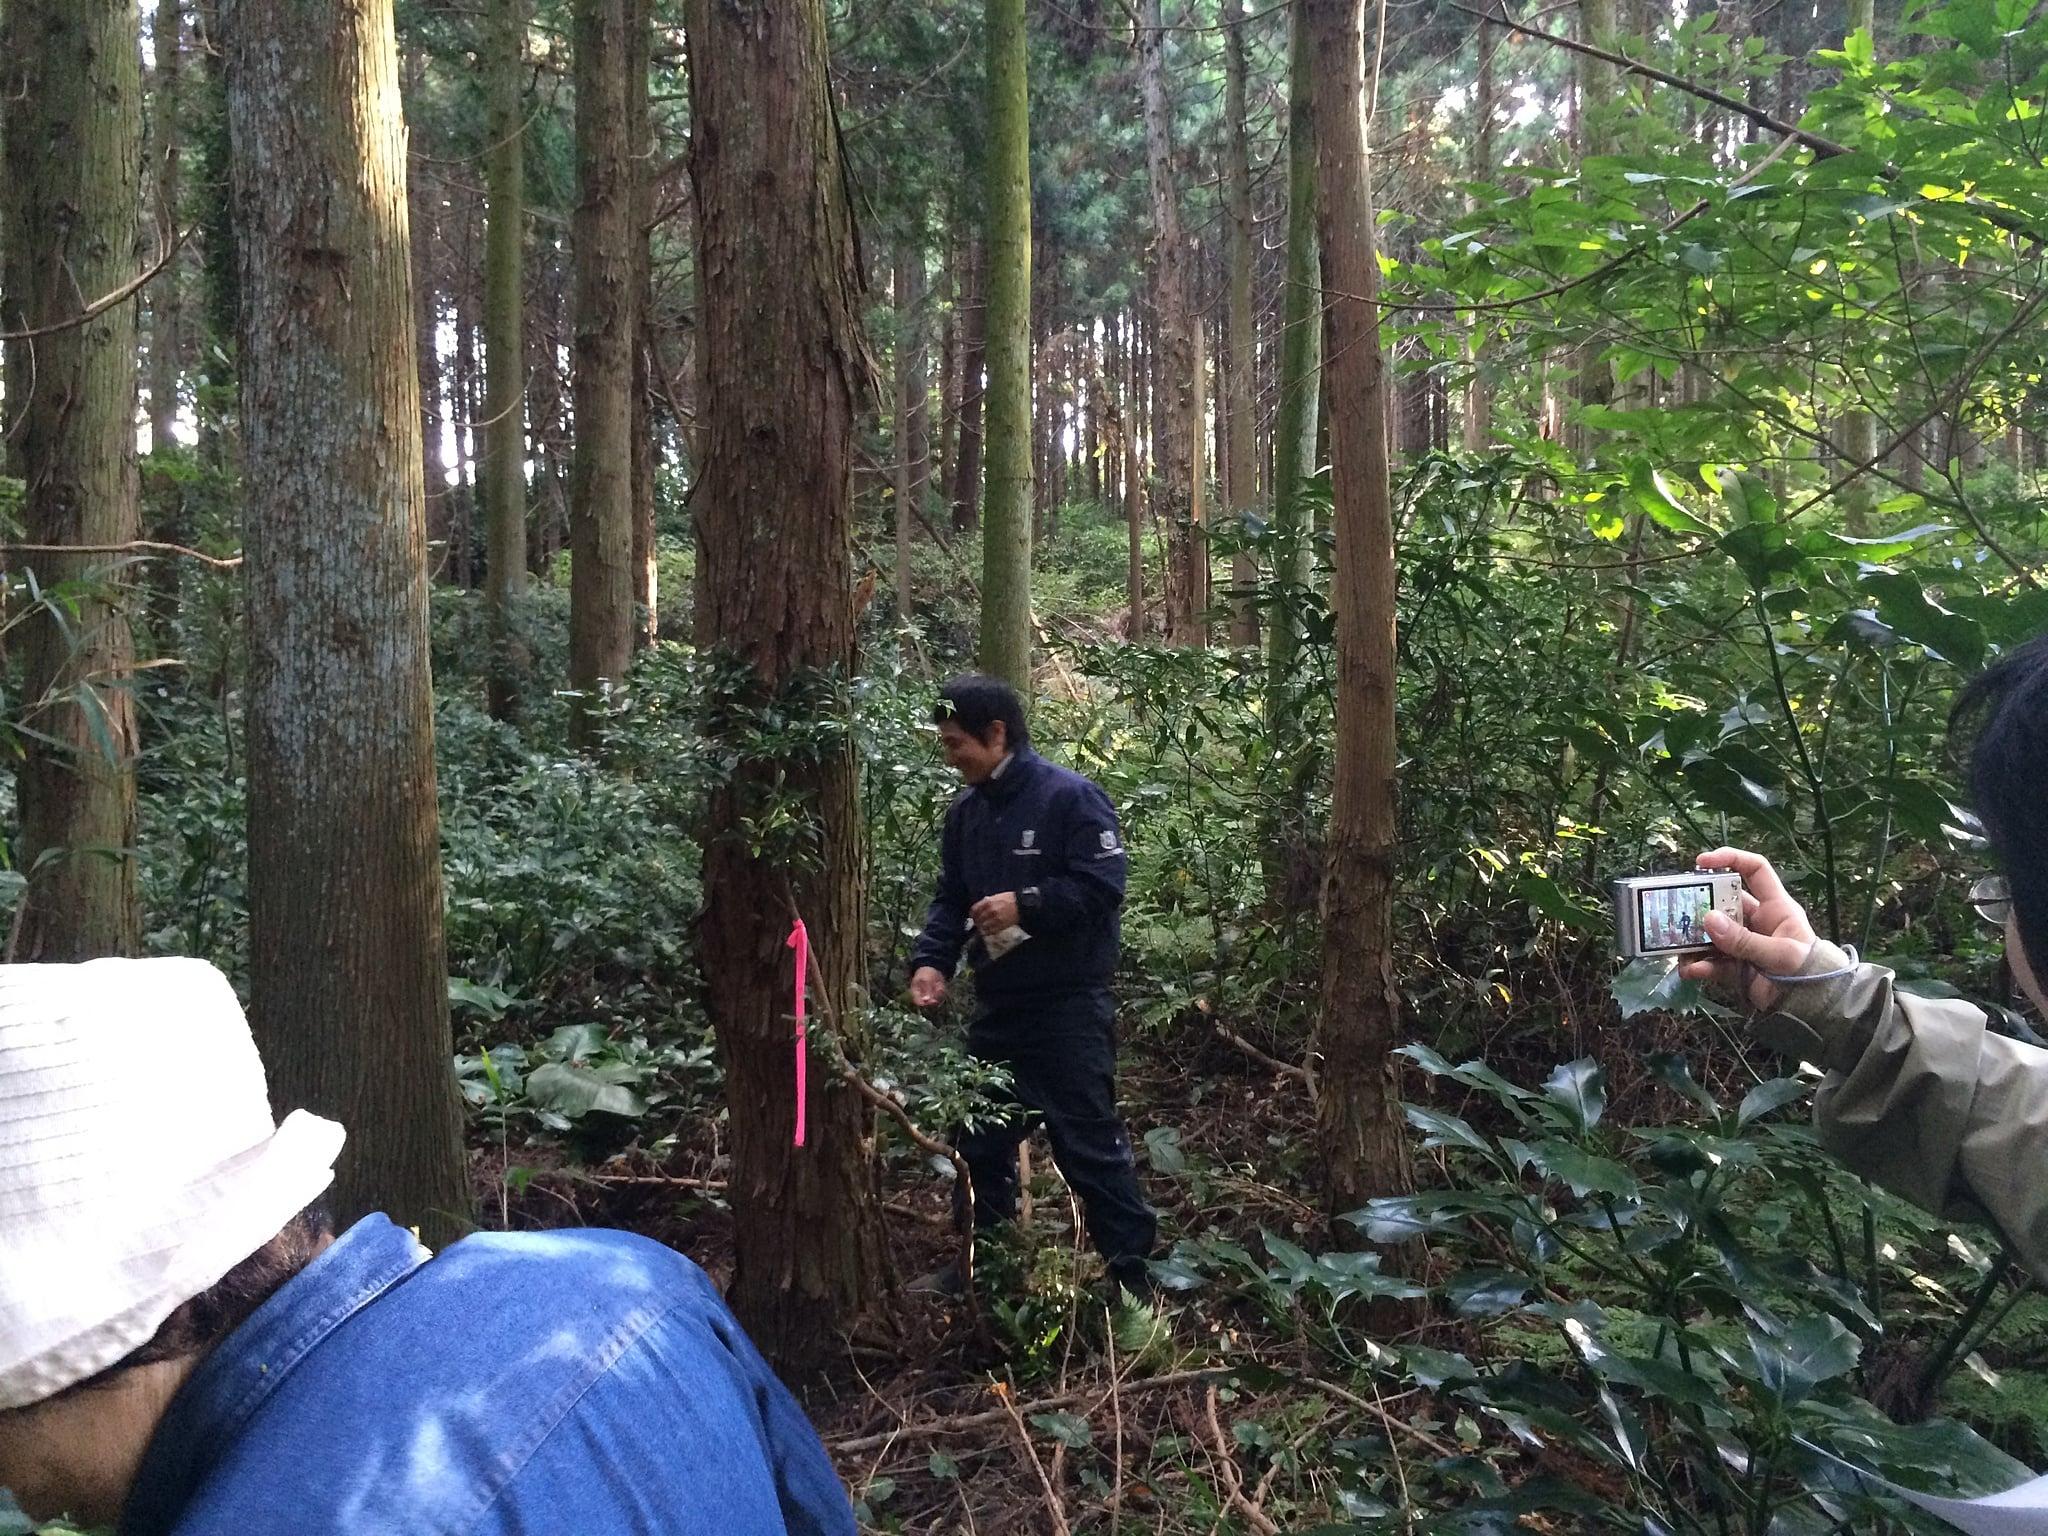 http://ogura-sekkei.jp/files/libs/14/2015110710262239.JPG